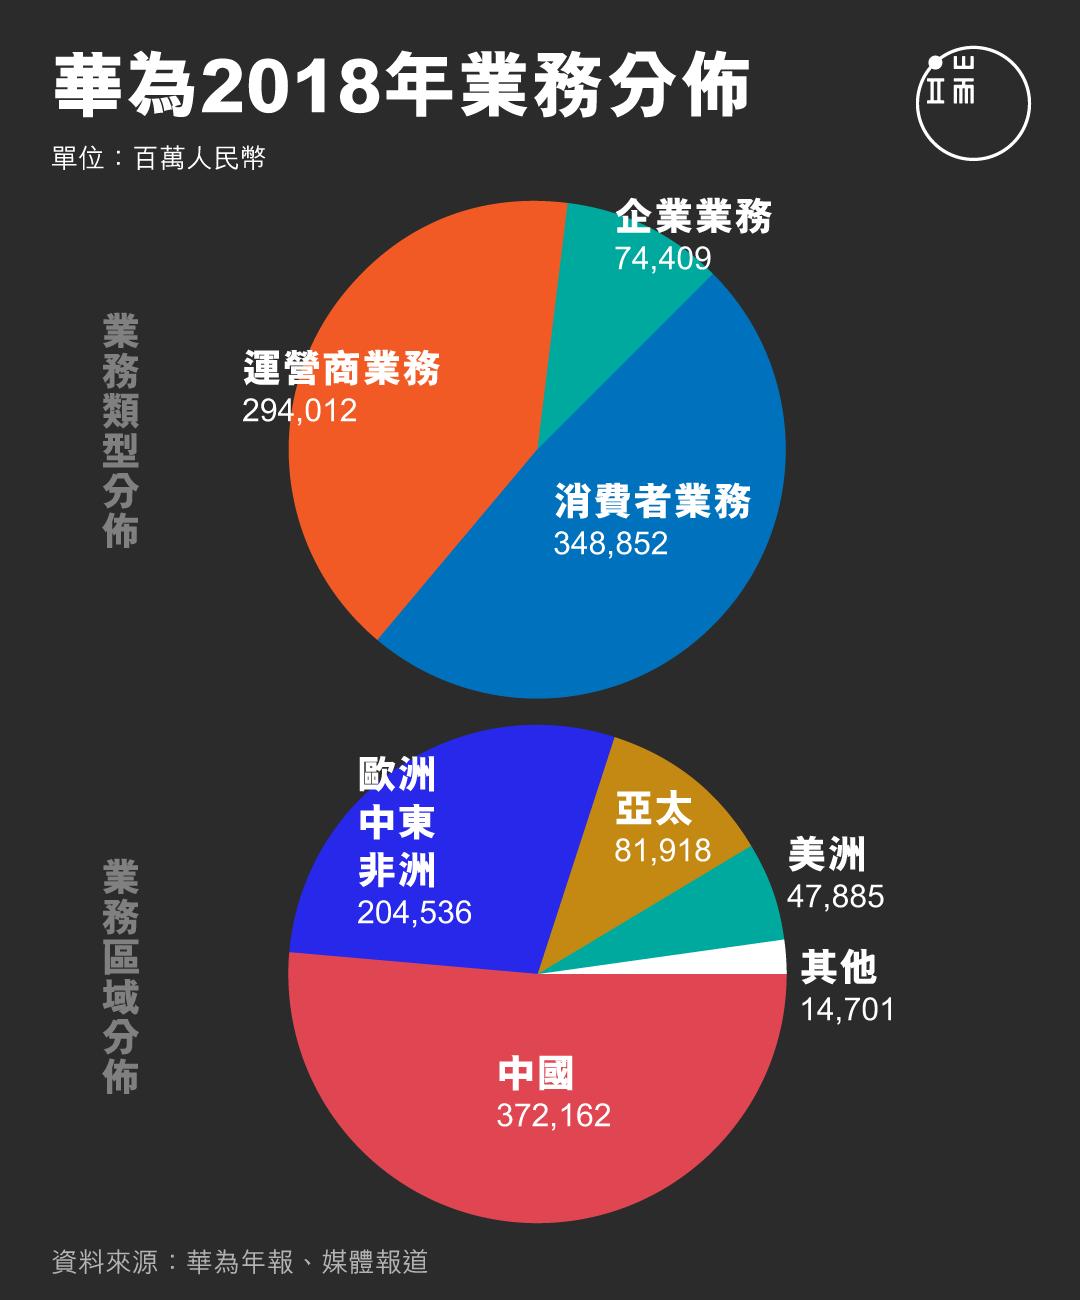 華為2018年業務分佈